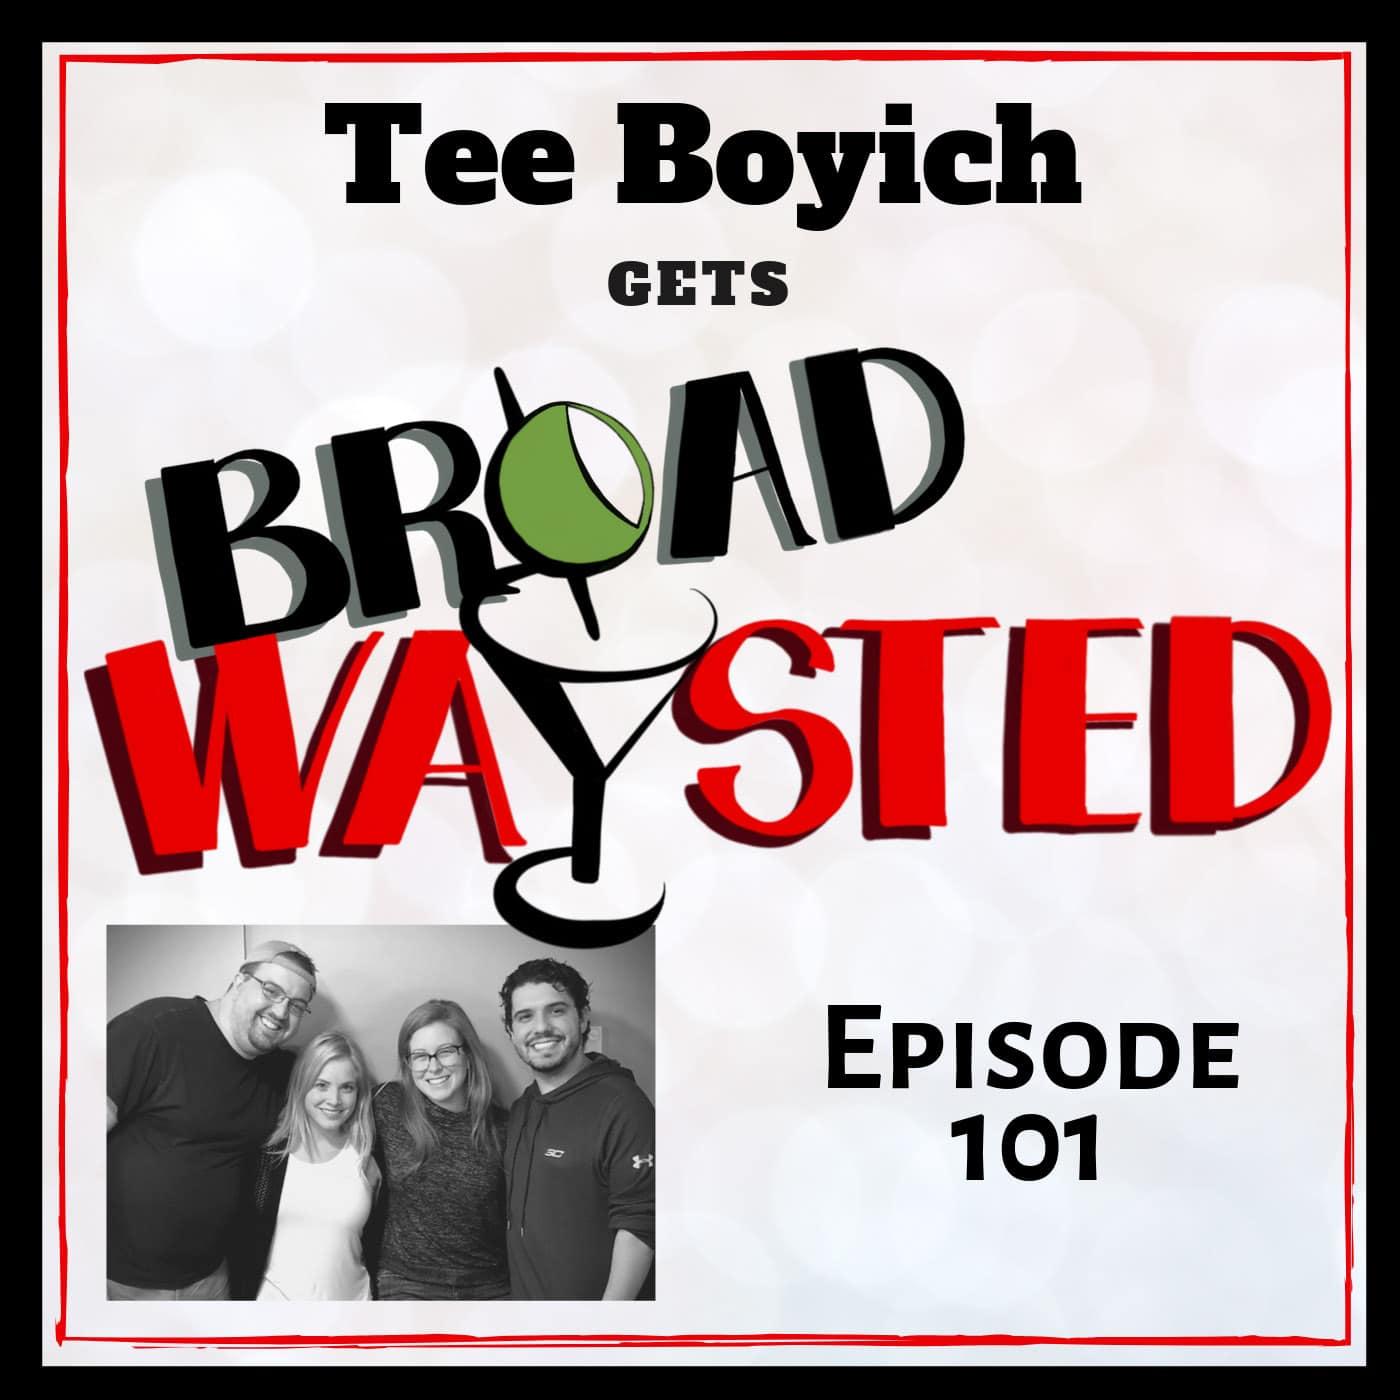 Broadwaysted Ep 101 Tee Boyich